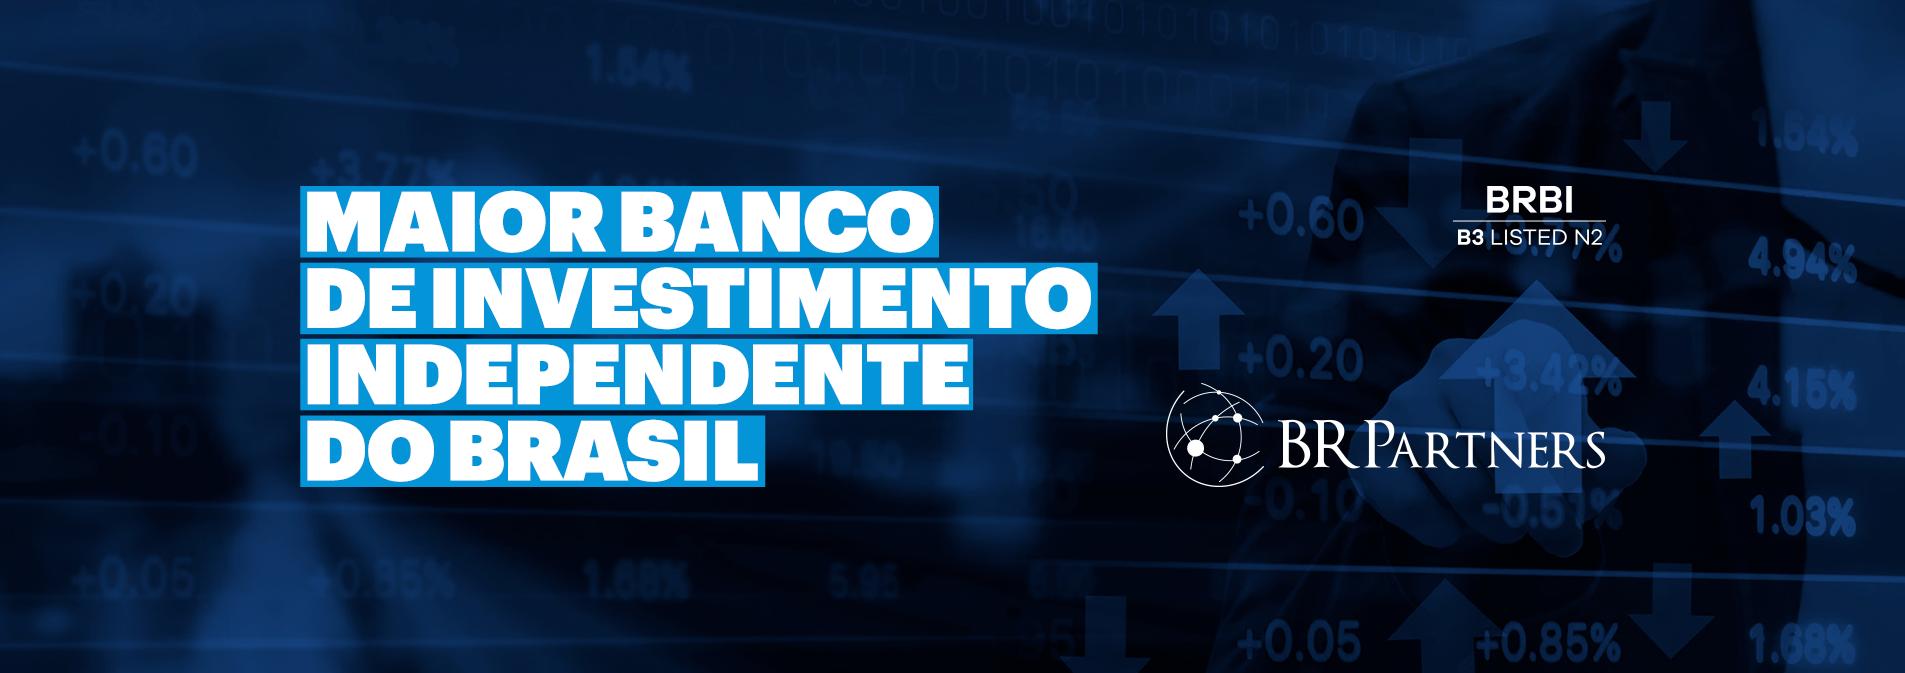 BR-Partners_Banner_Site_Banco_de_Investimento_Independente